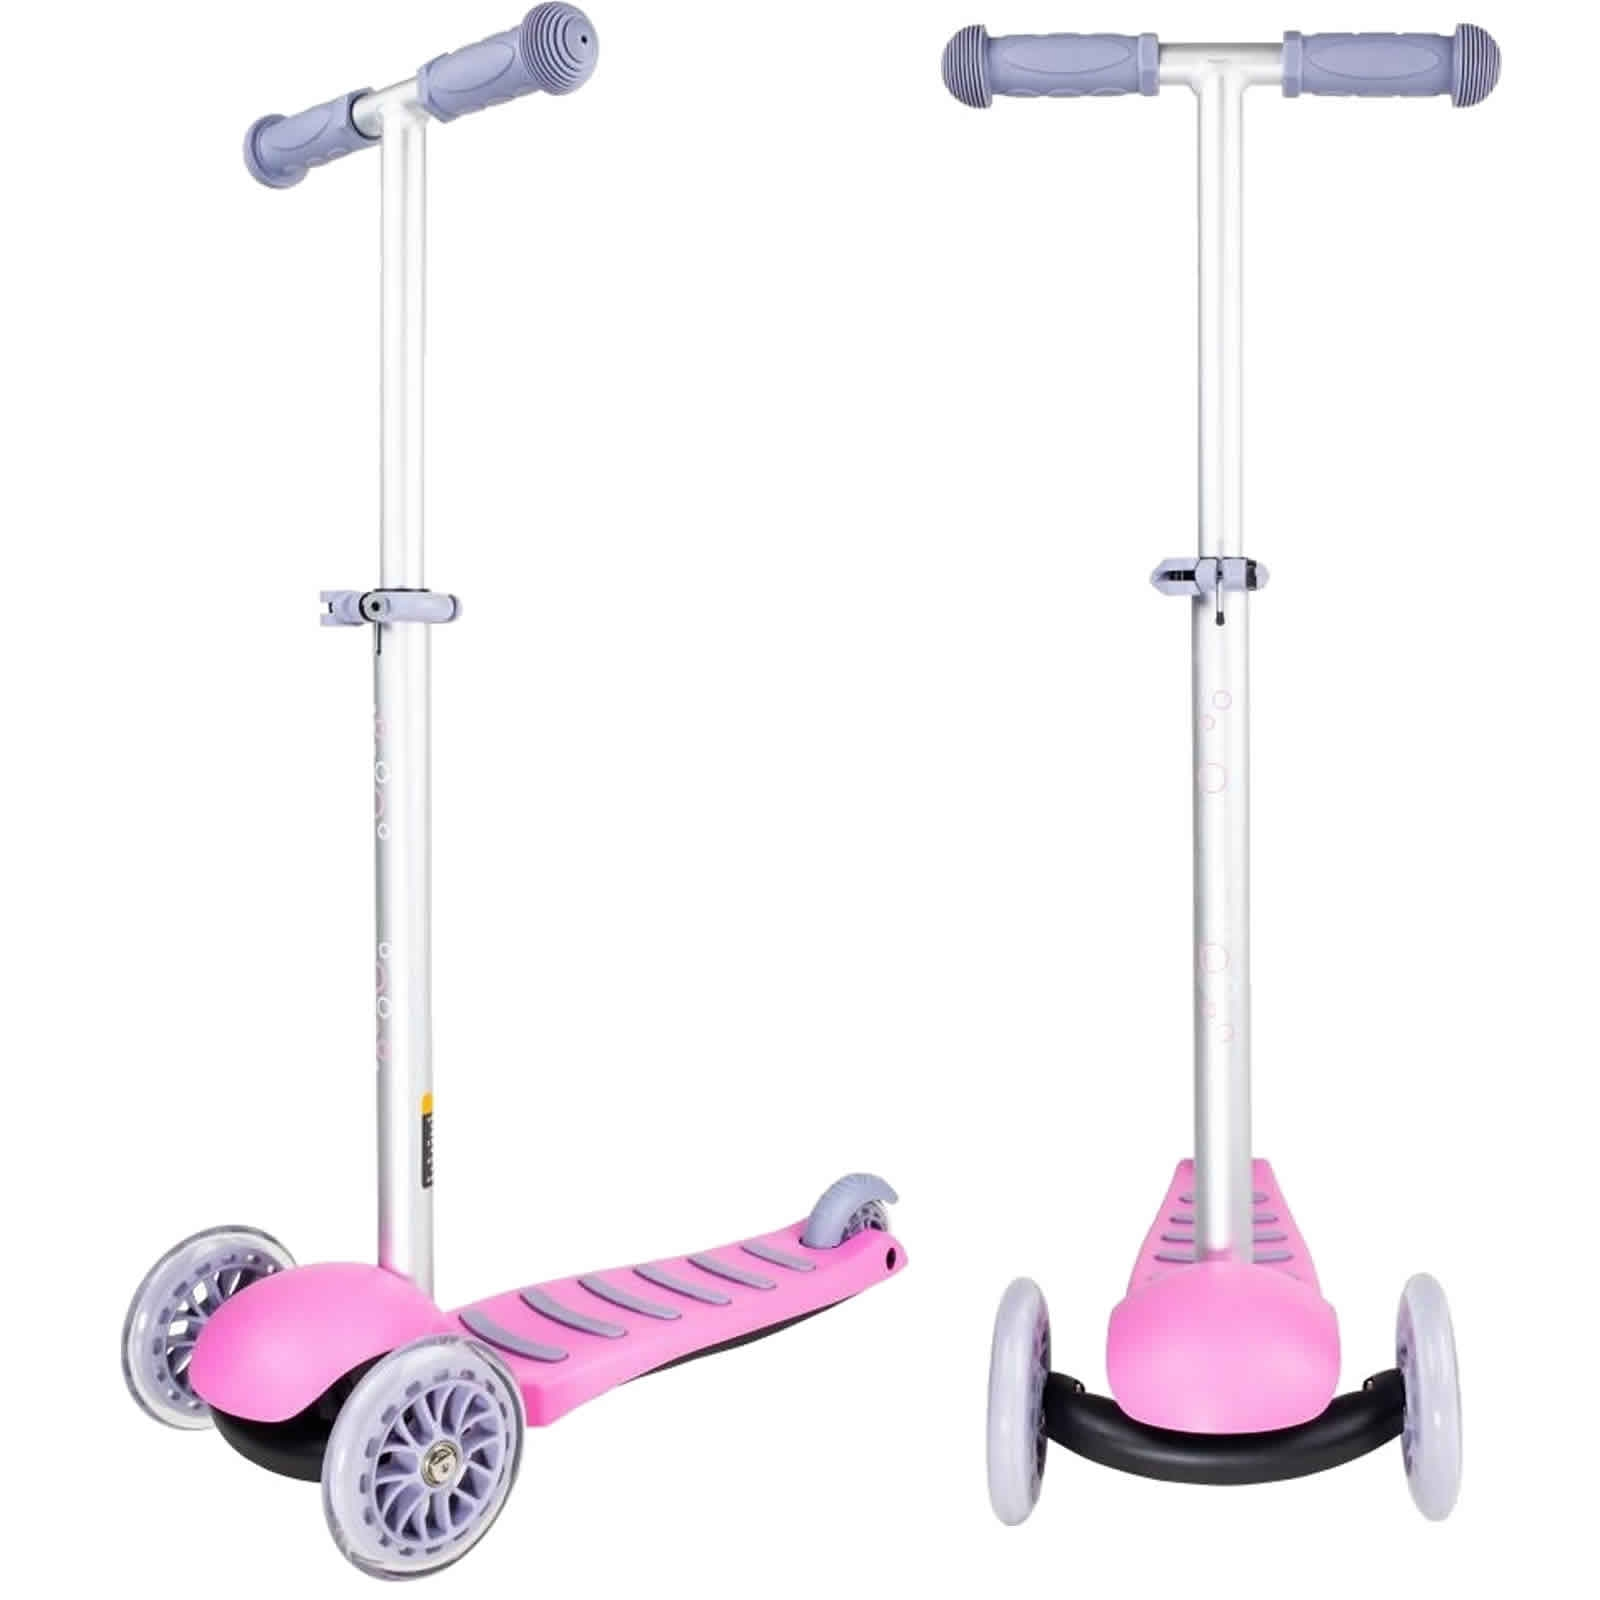 An image of Atlantic Nano Junior 3 Wheel Scooter - Pink